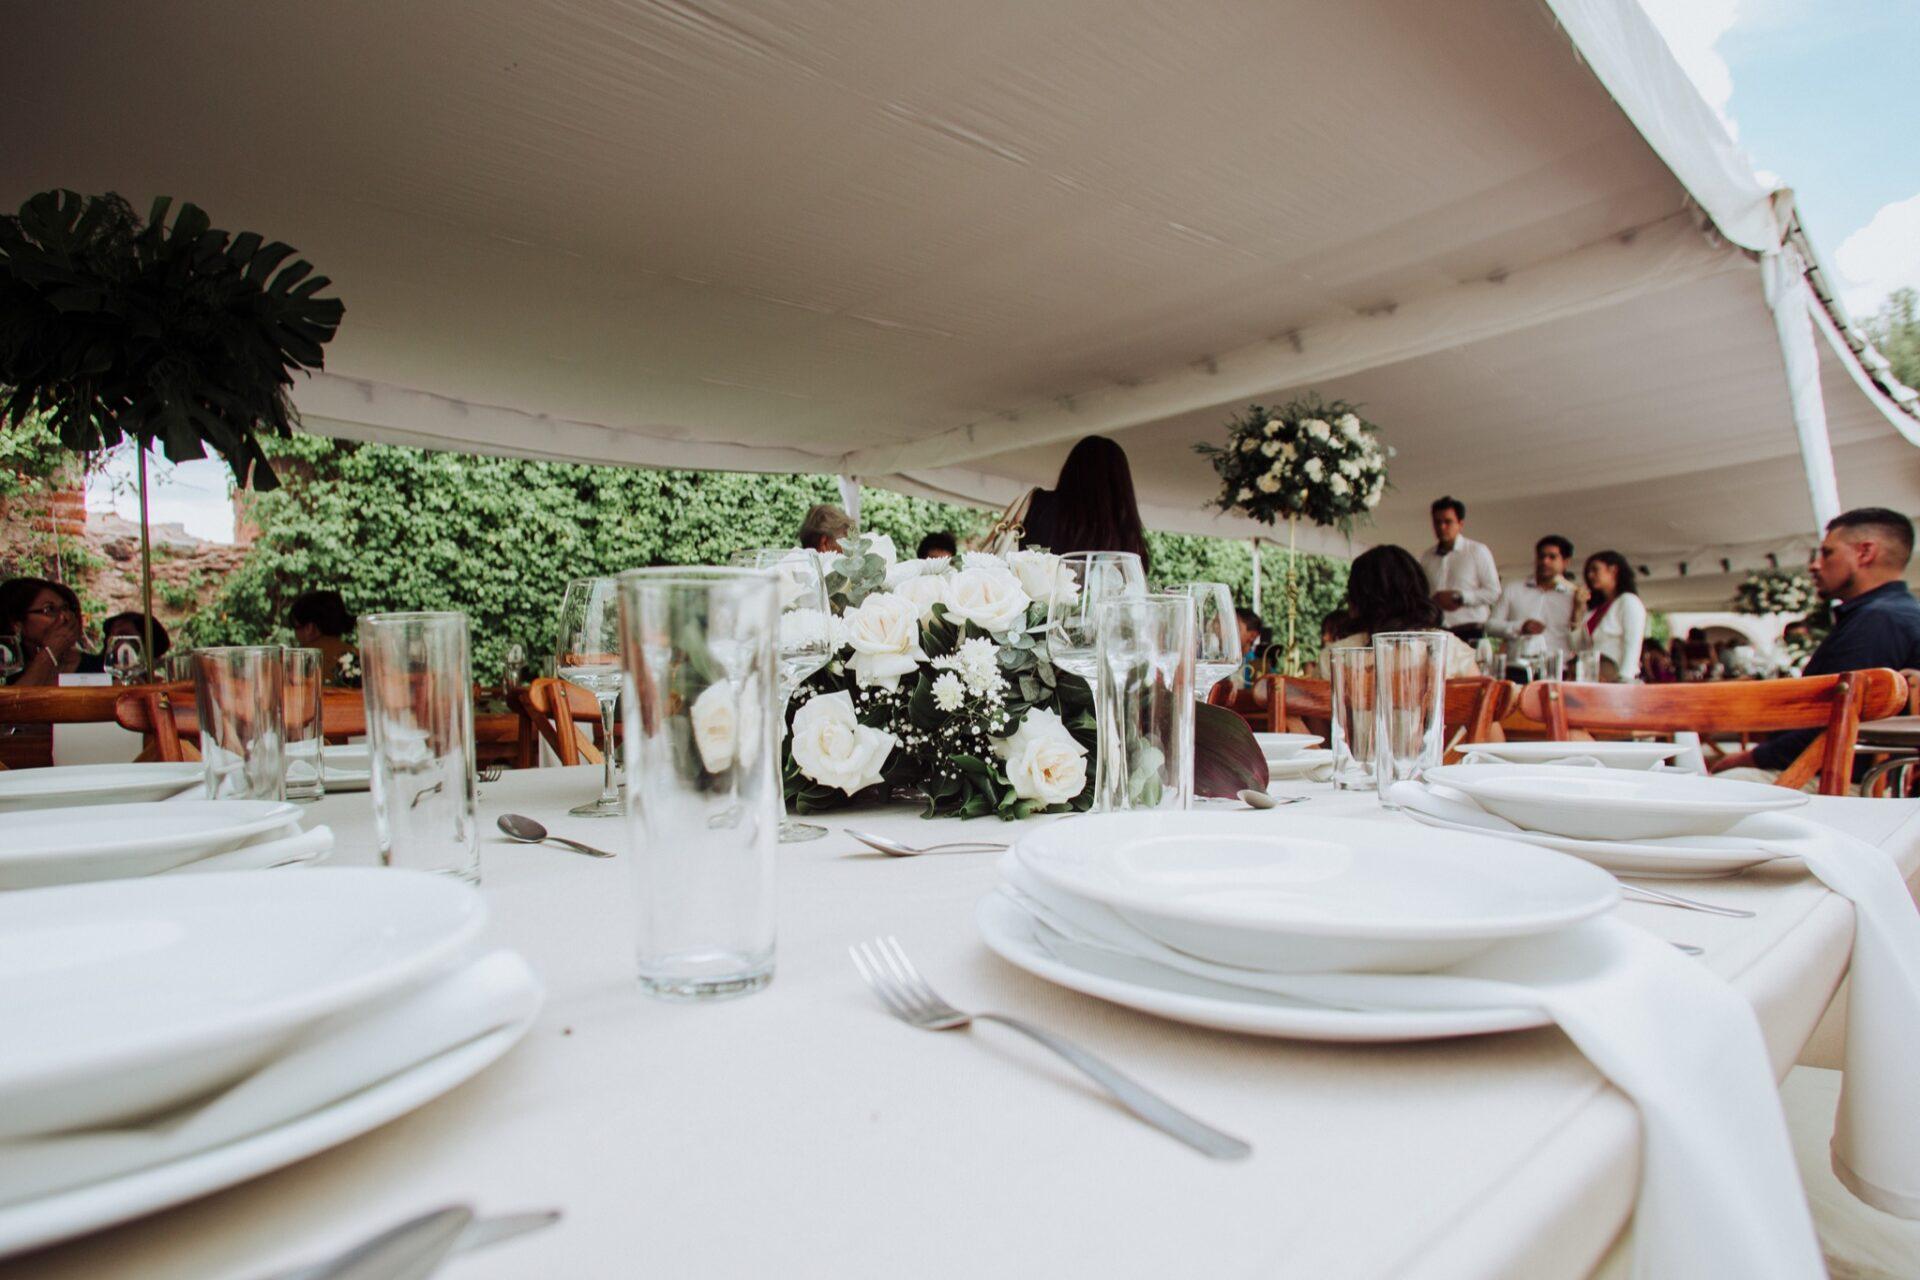 javier_noriega_fotografo_bodas_centro_platero_zacatecas_wedding_photographer20